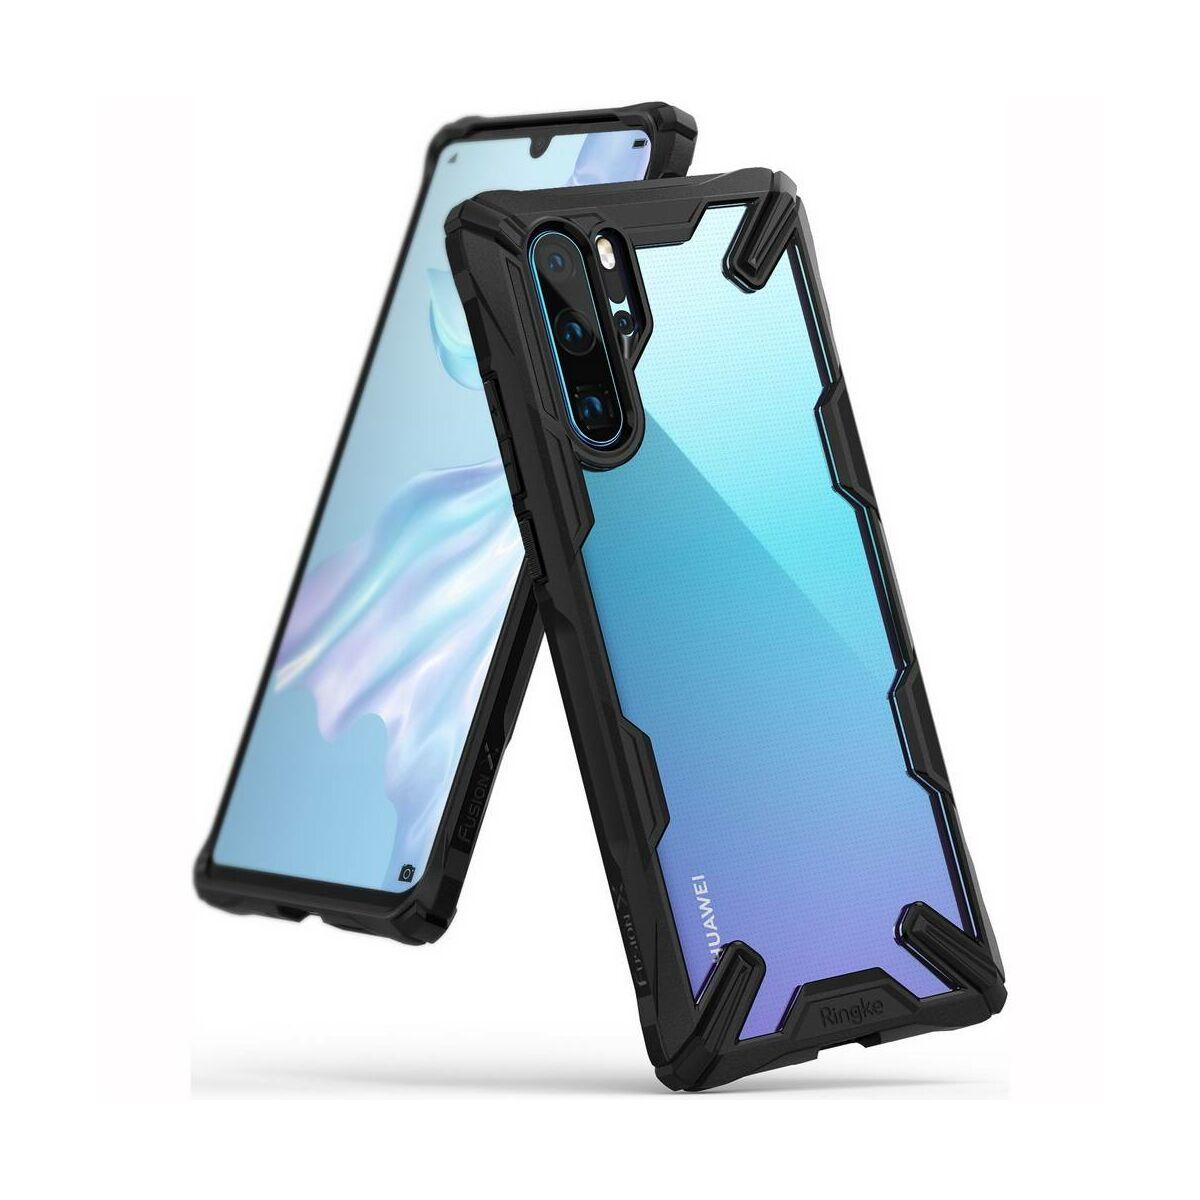 Ringke Huawei P30 Pro tok, Fusion X, fekete